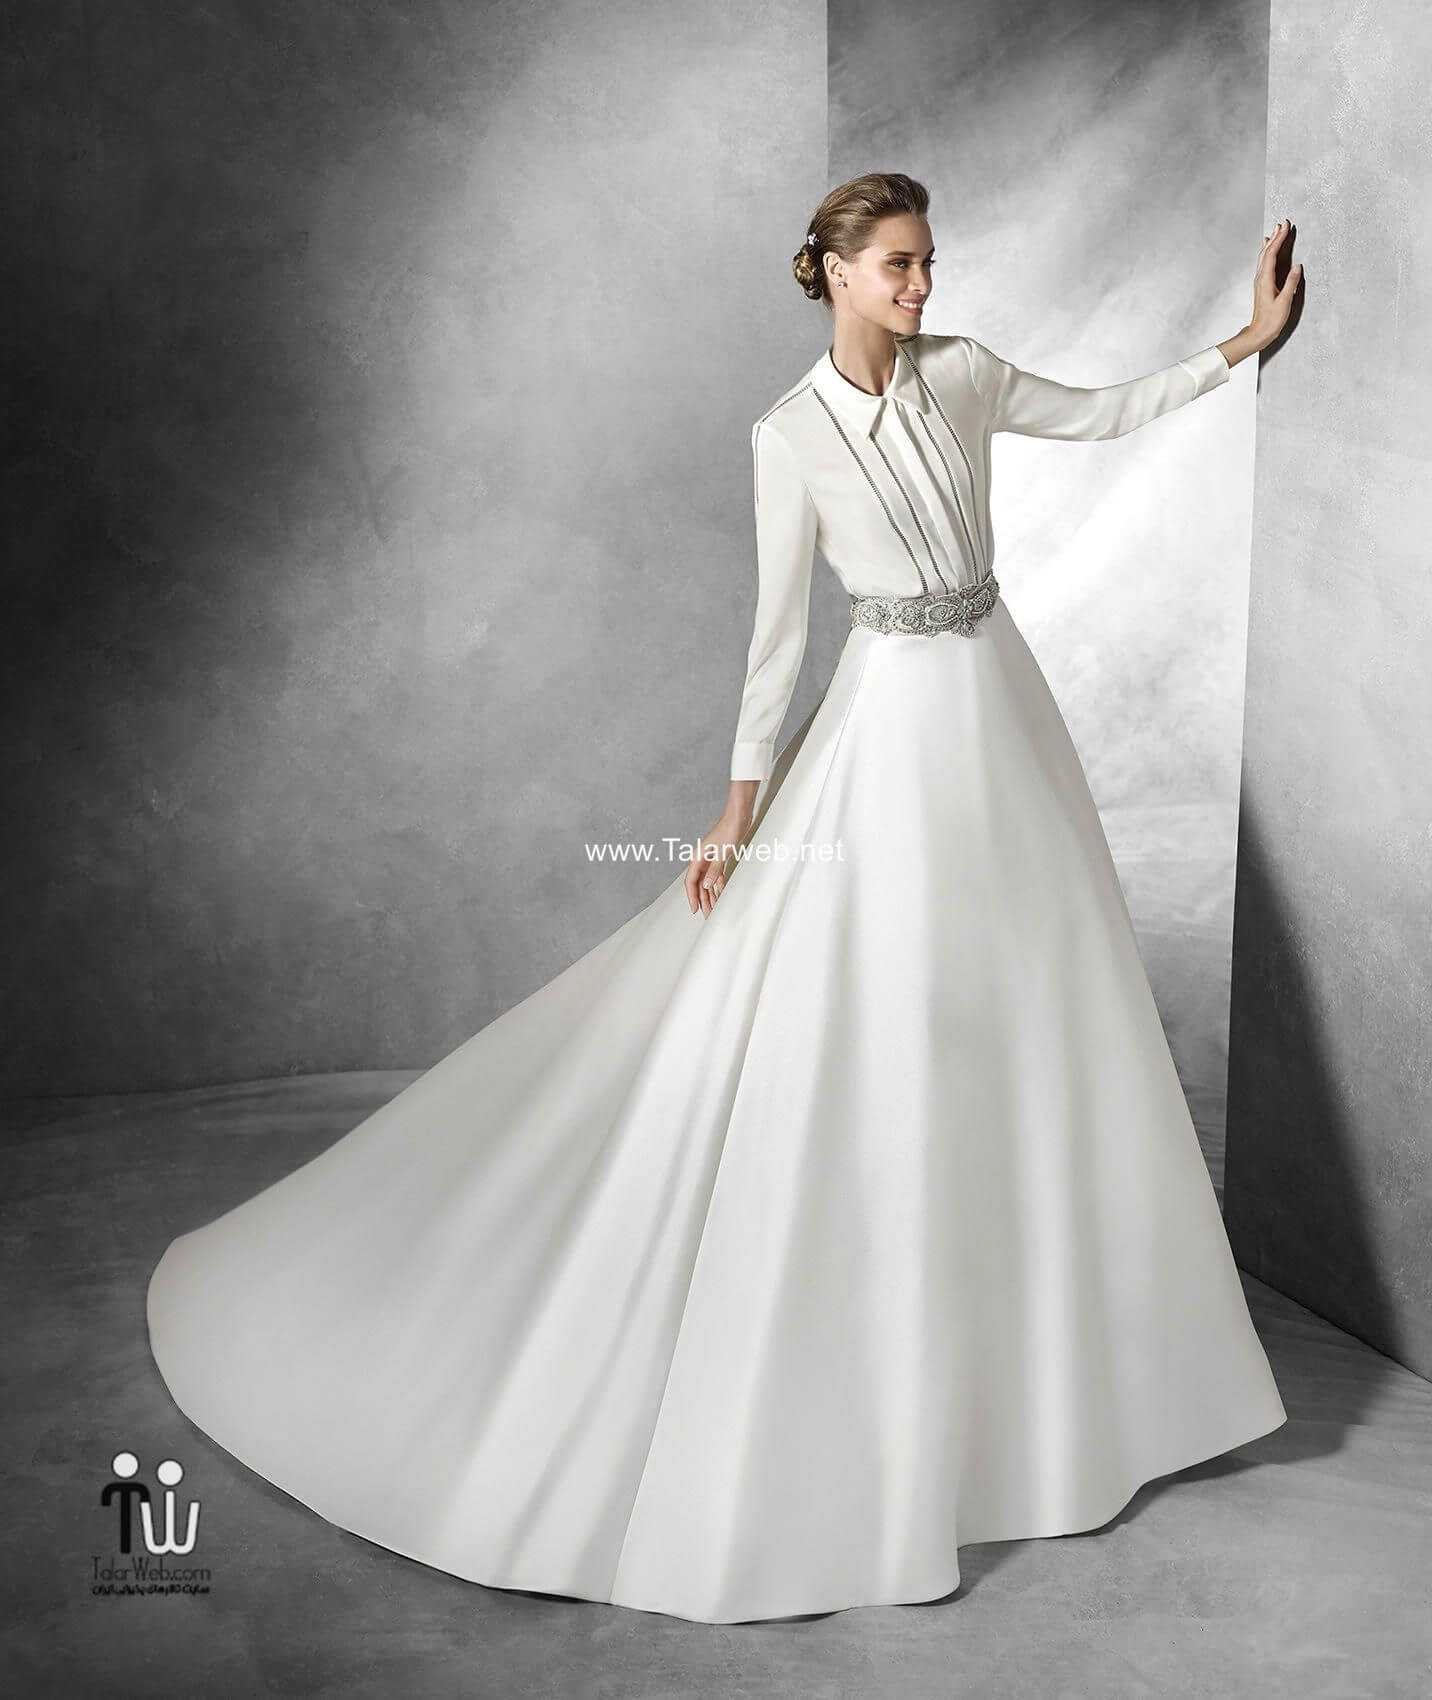 Wedding dresses bridal 2016 41 - مدل لباس عروس ۲۰۱۶ - سری۳